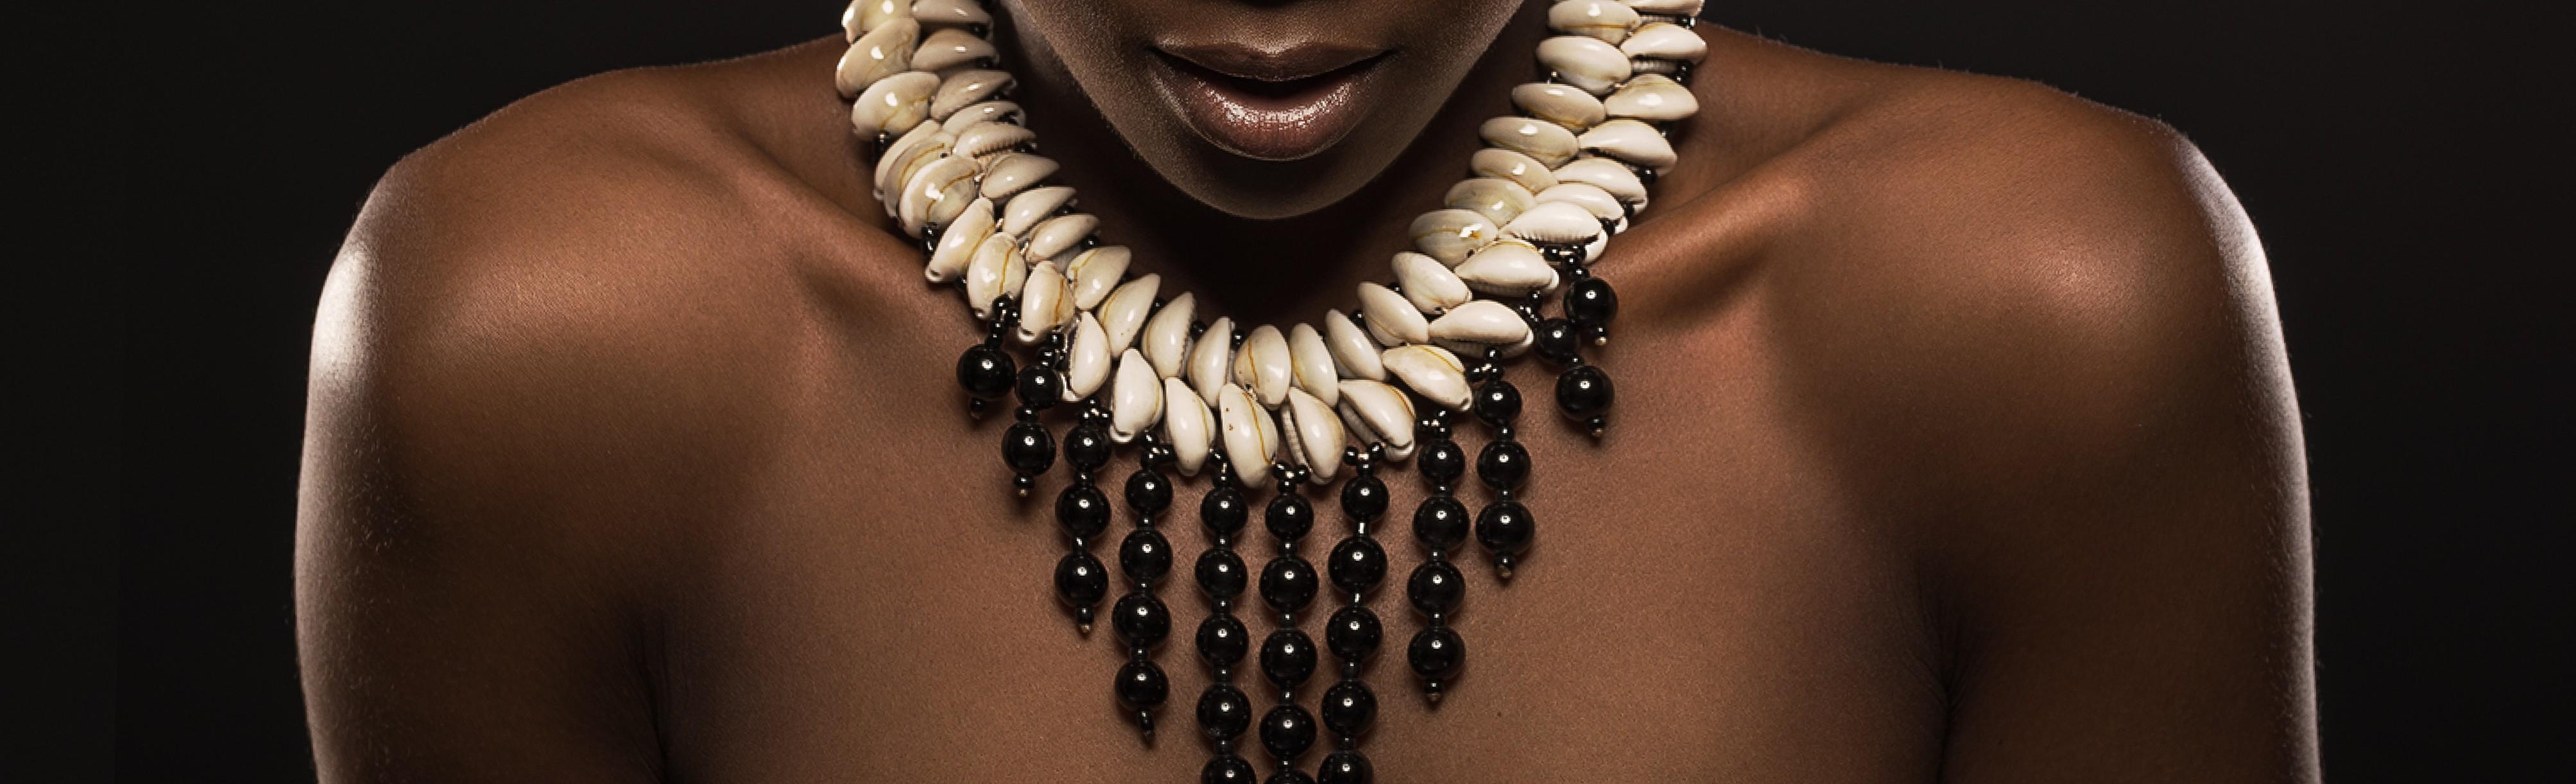 rsovaj artisanat ethnique